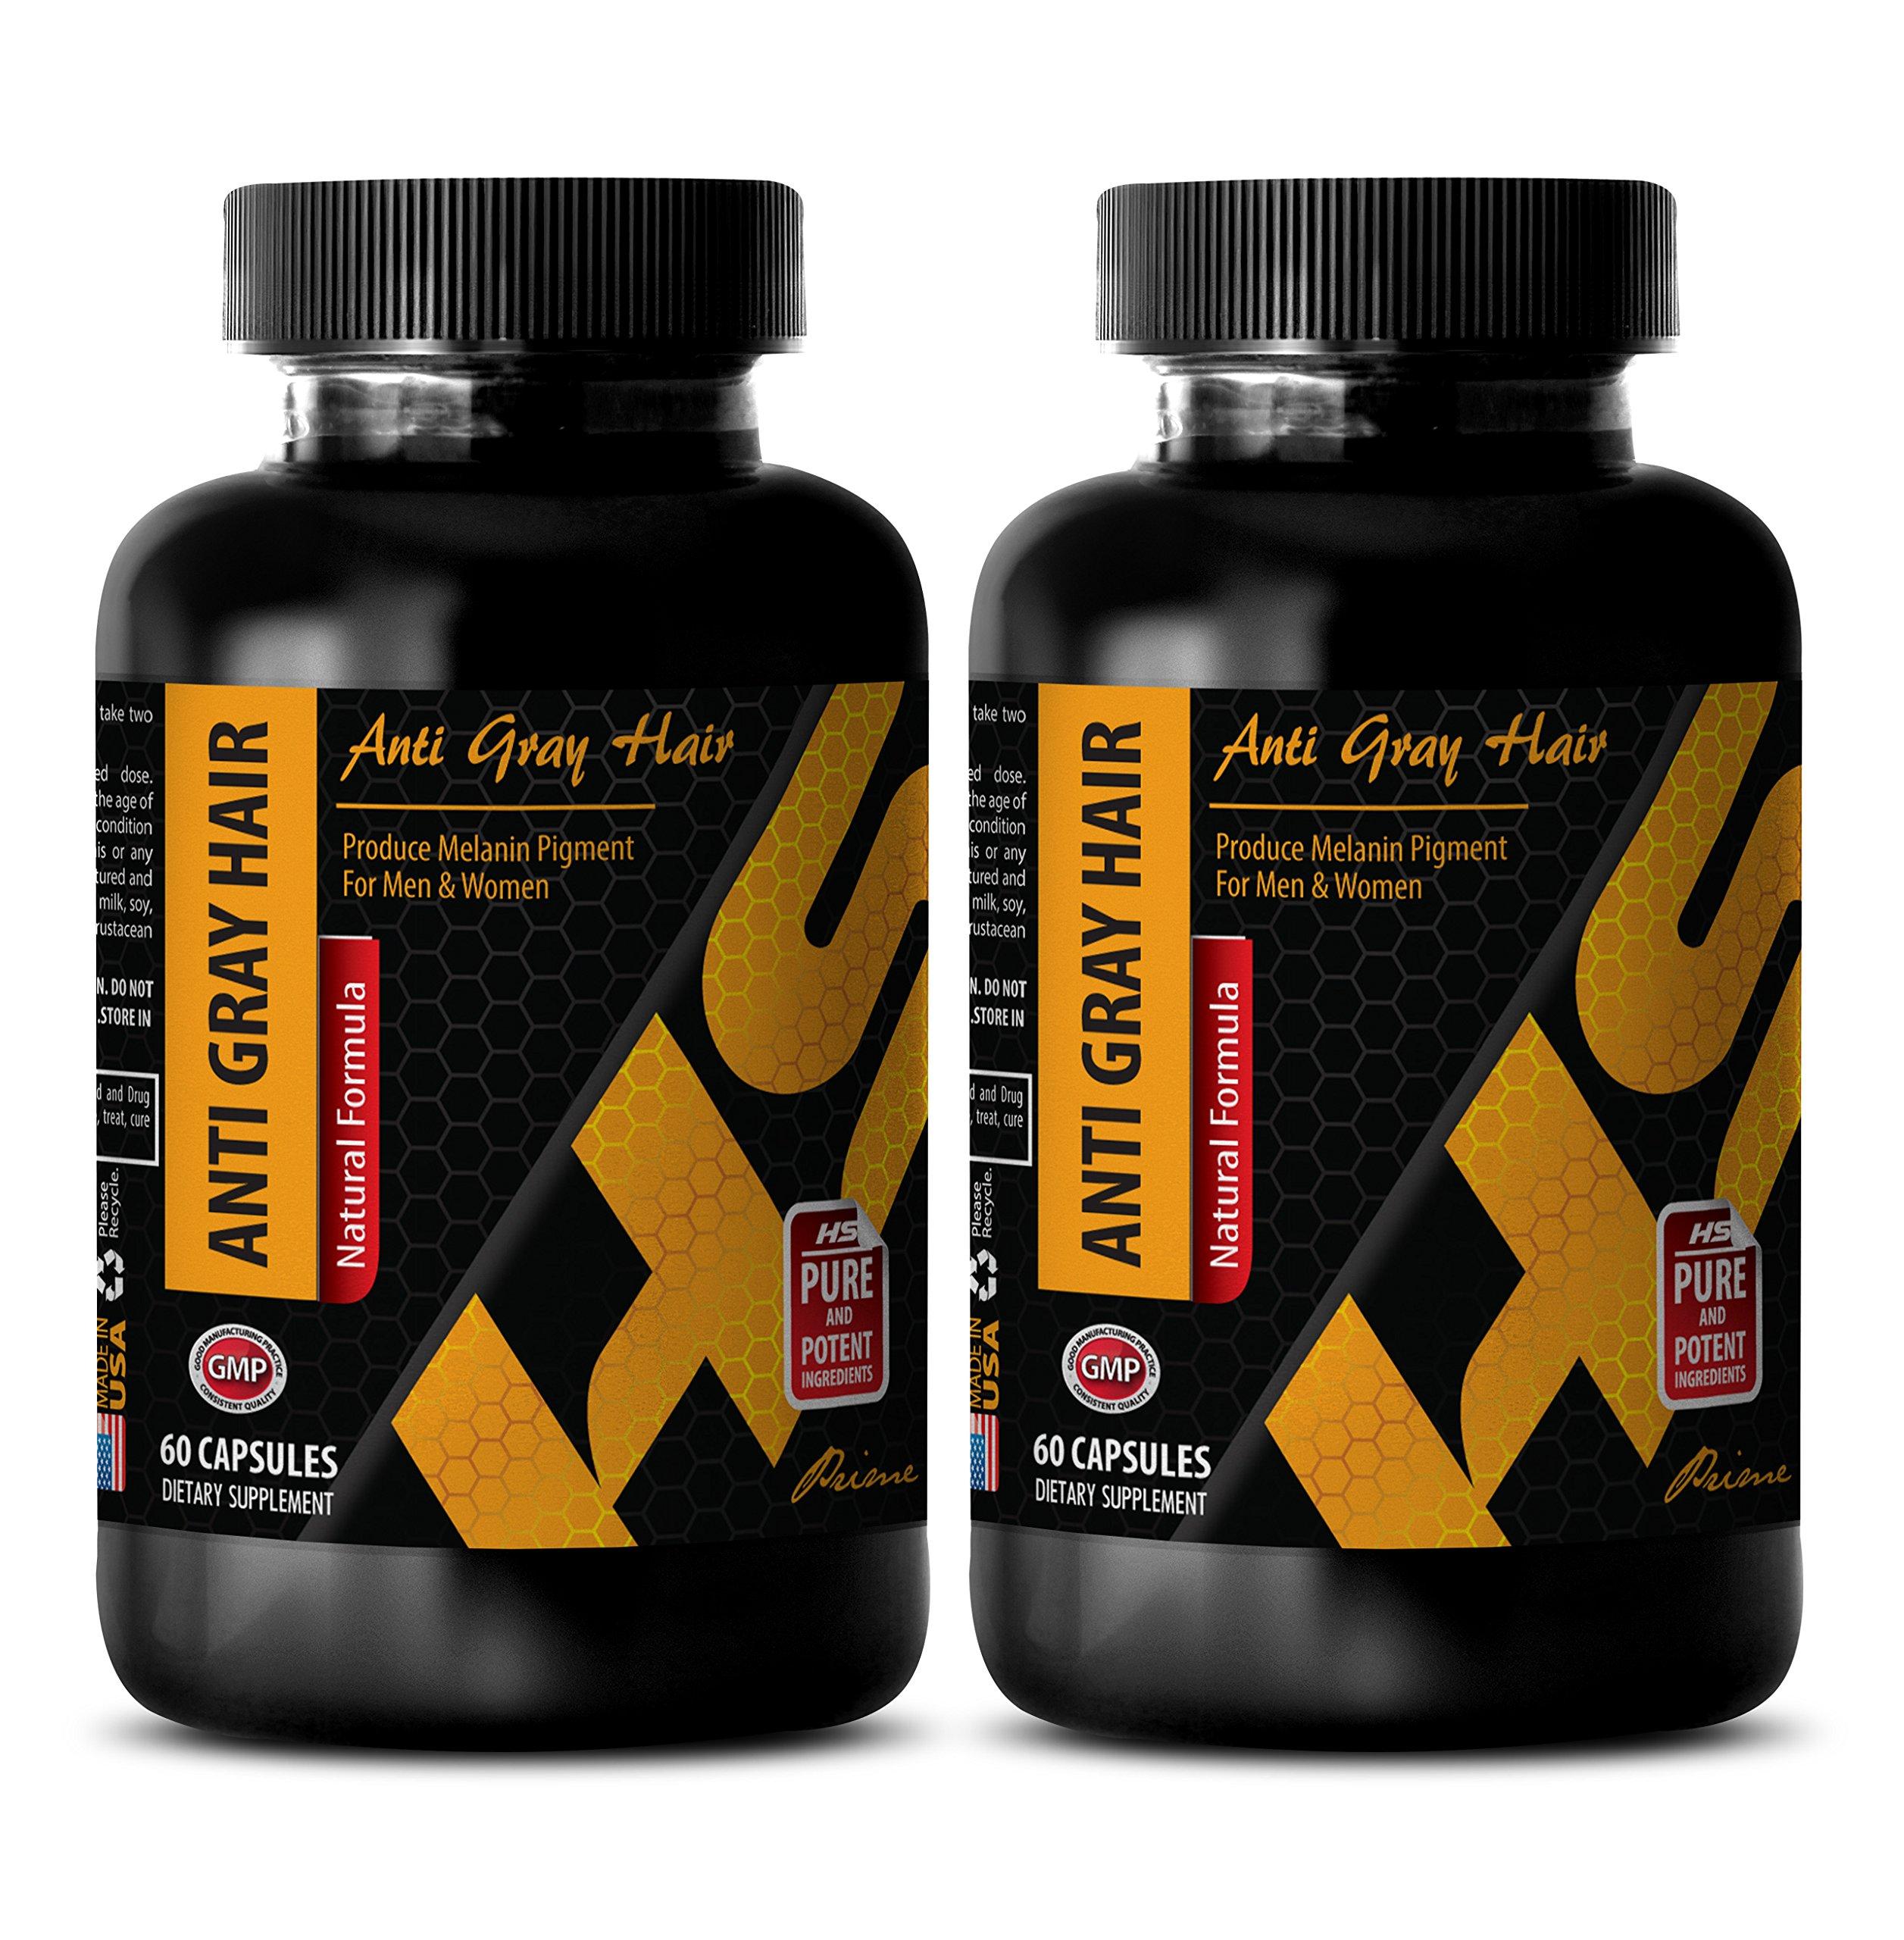 antiaging - ANTI GRAY HAIR - NATURAL FORMULA - nettle herb bulk - 2 Bottles (120 Capsules)